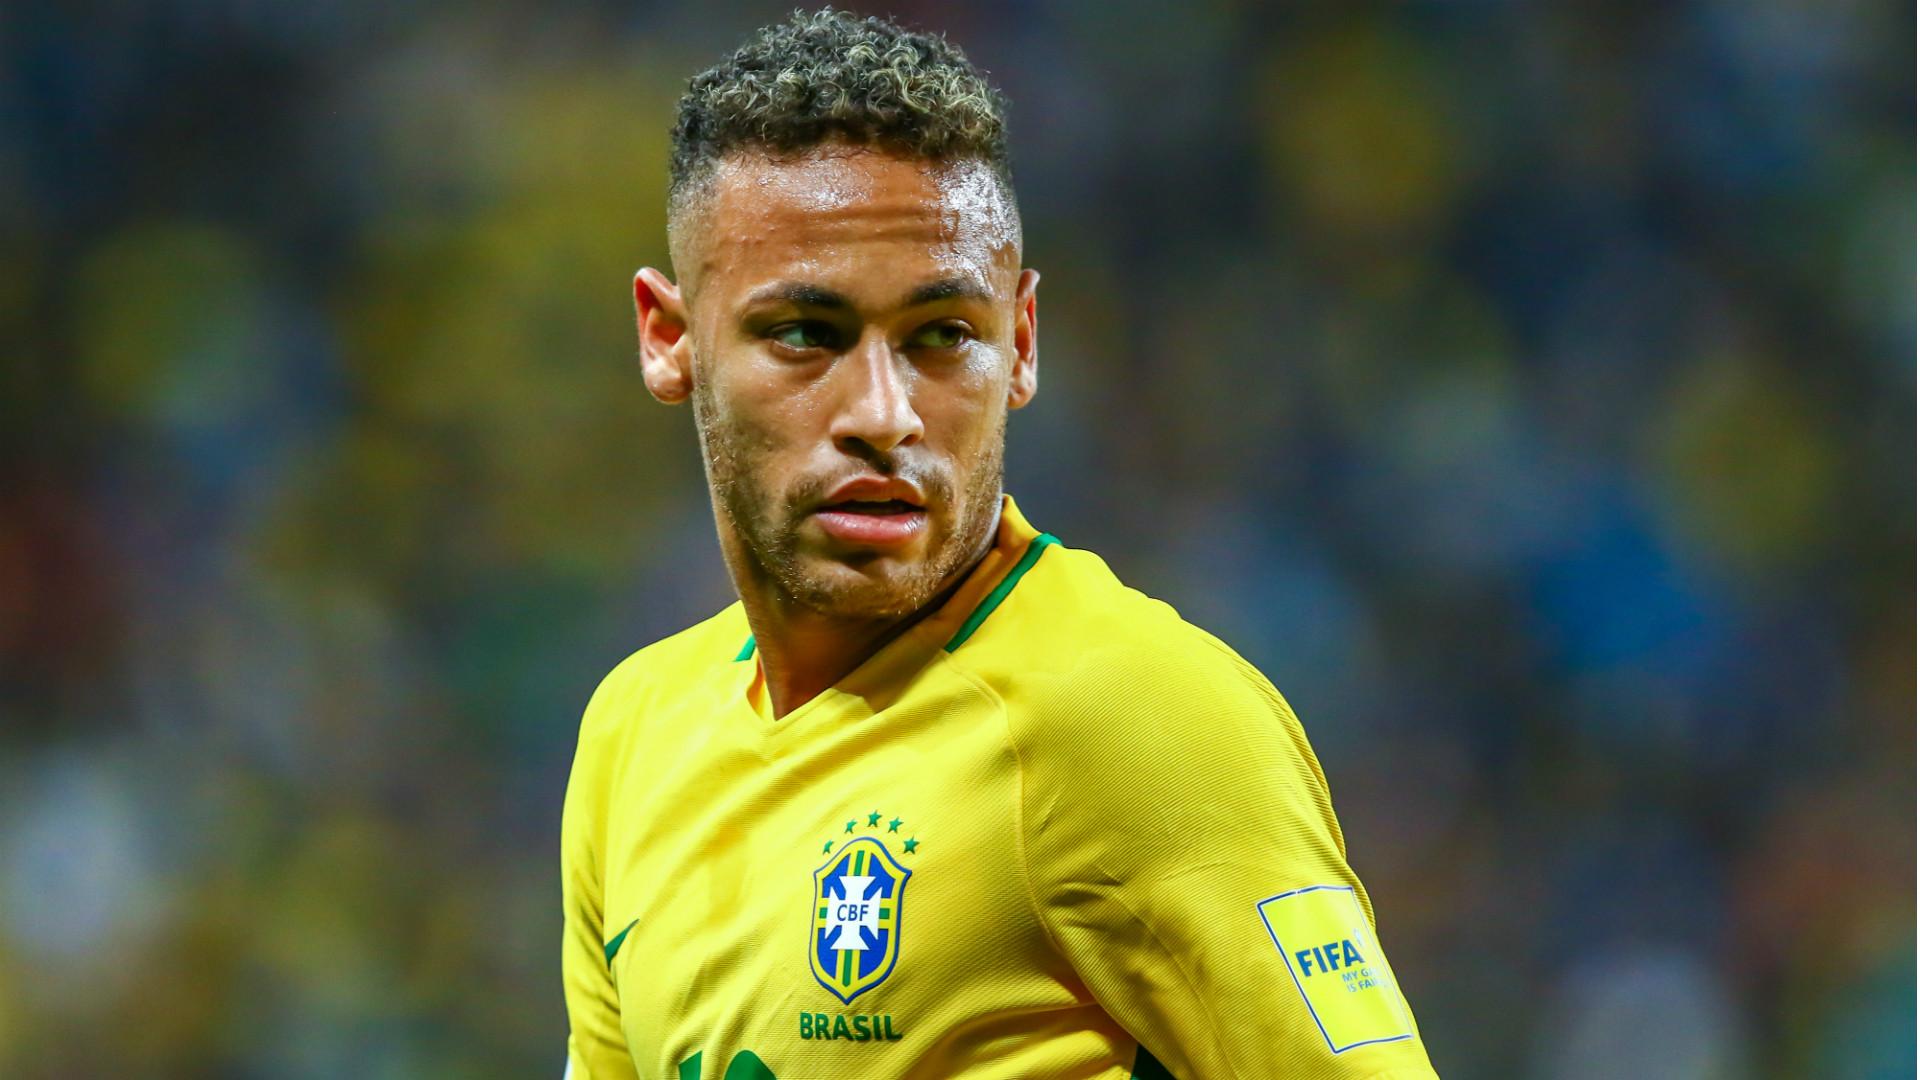 Download Chile World Cup 2018 - neymar-brazil_14pog467nu2qt19ww3p14h1aew  Picture_703312 .jpg?t\u003d-557307218